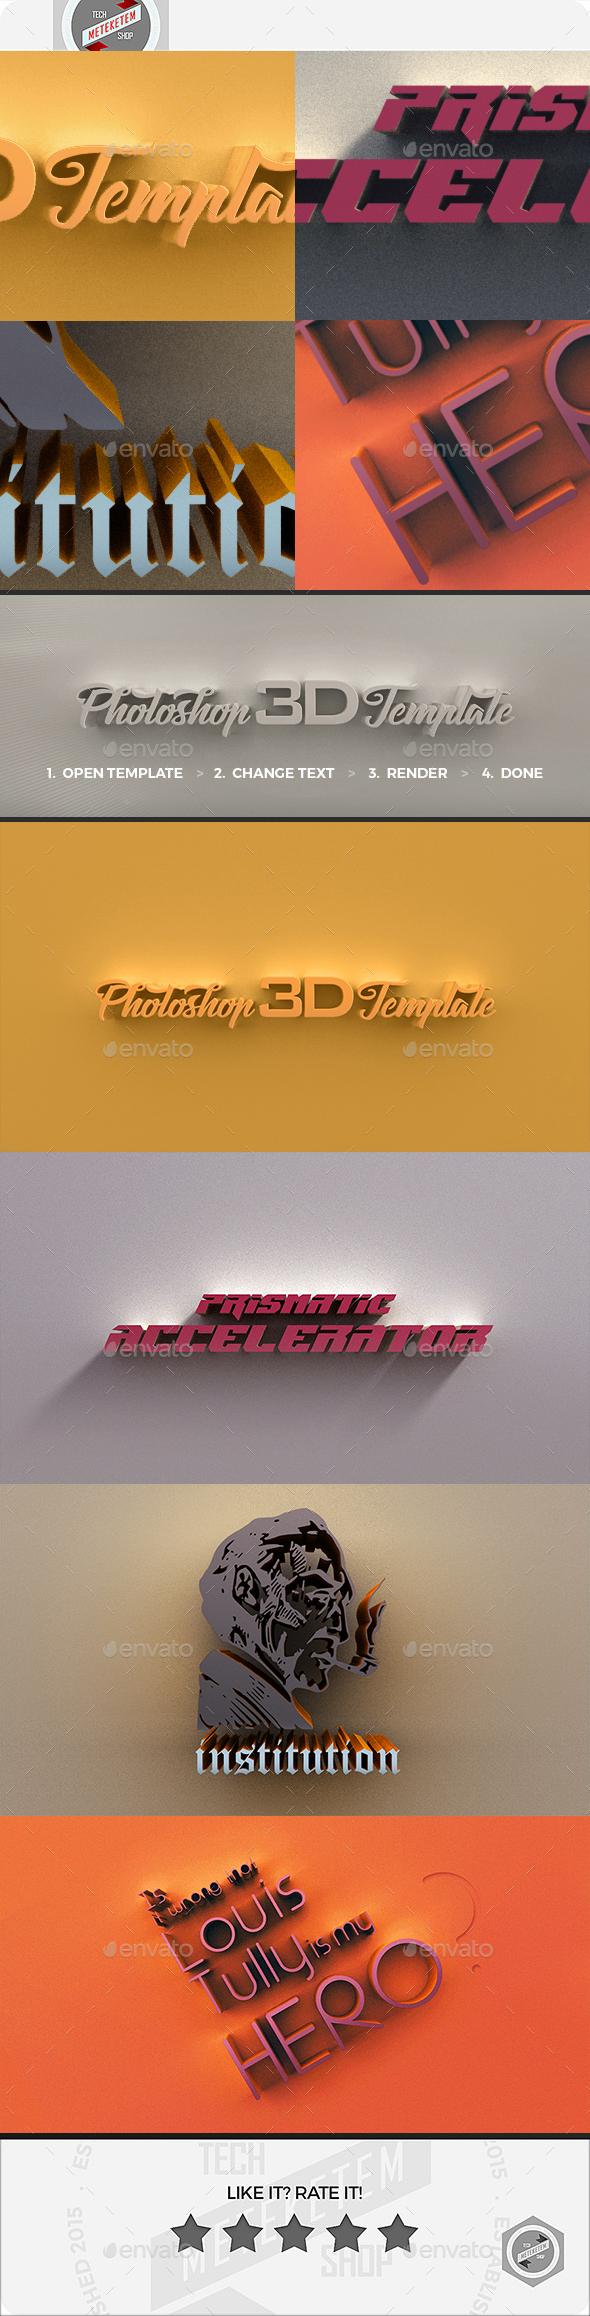 3D Photoshop Template 3 - Text 3D Renders